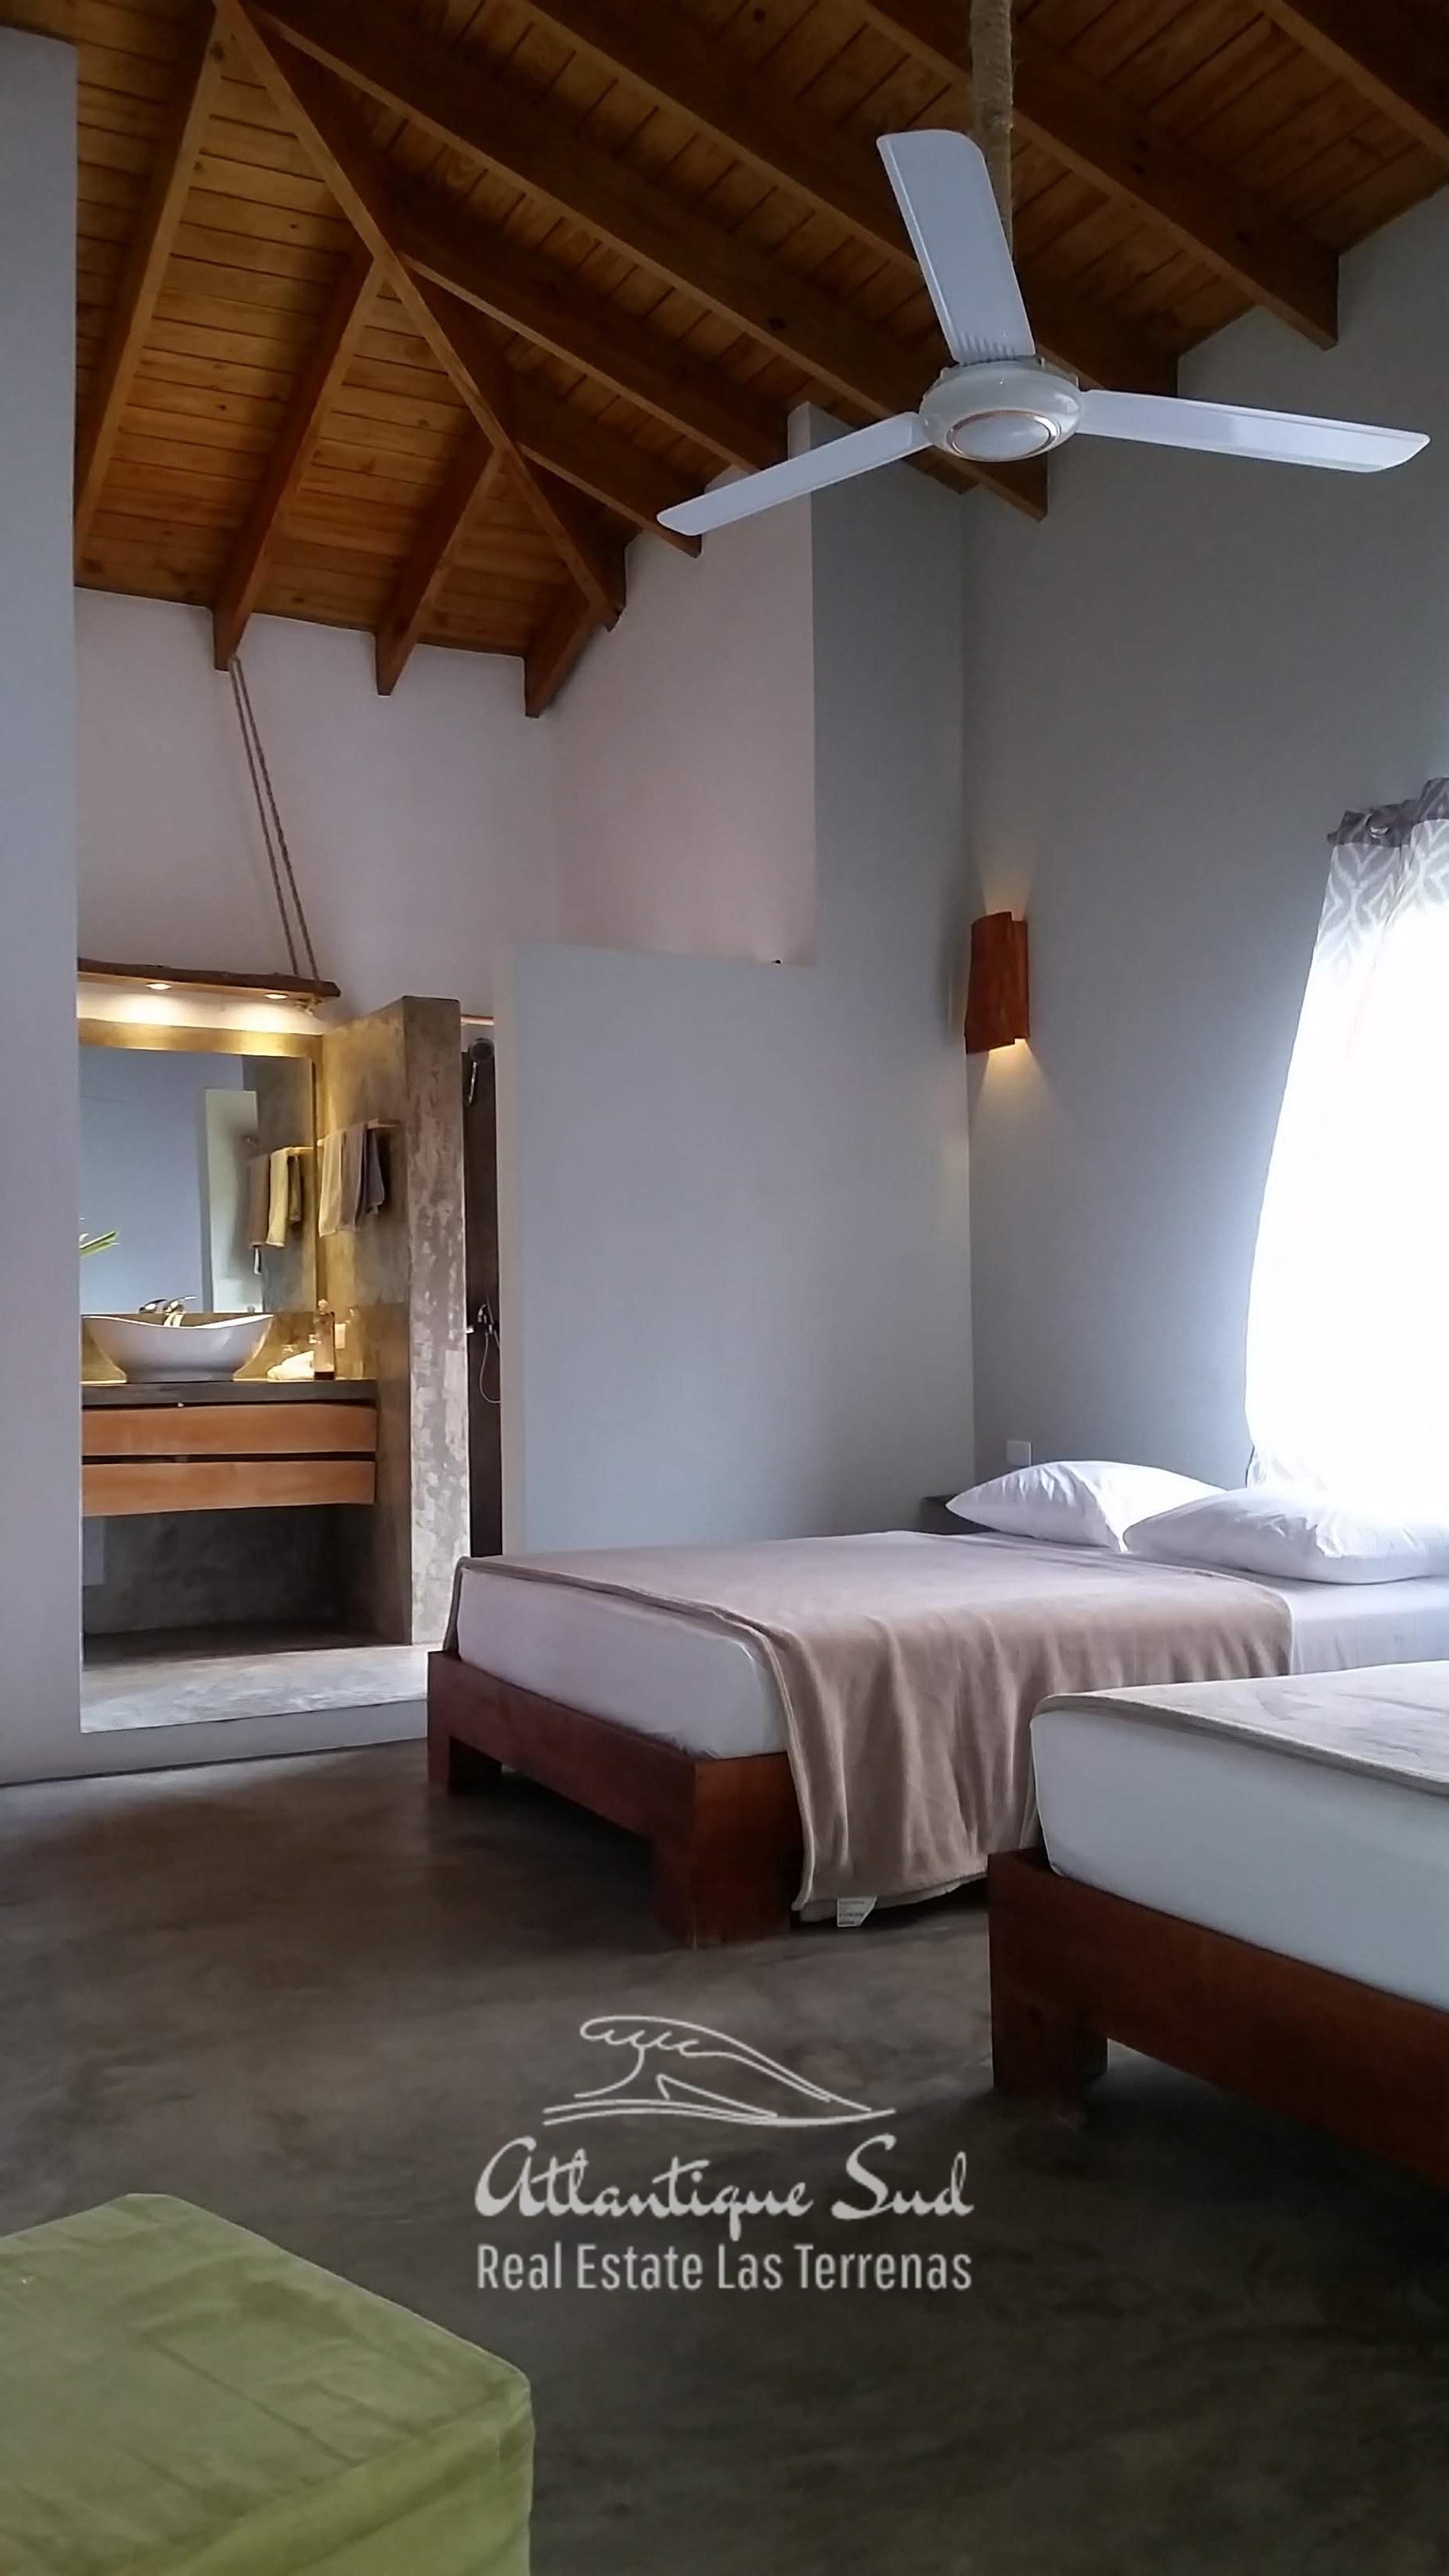 Typical caribbean hotel for sale Real Estate Las Terrenas Dominican Republic Atlantique Sud6.jpg